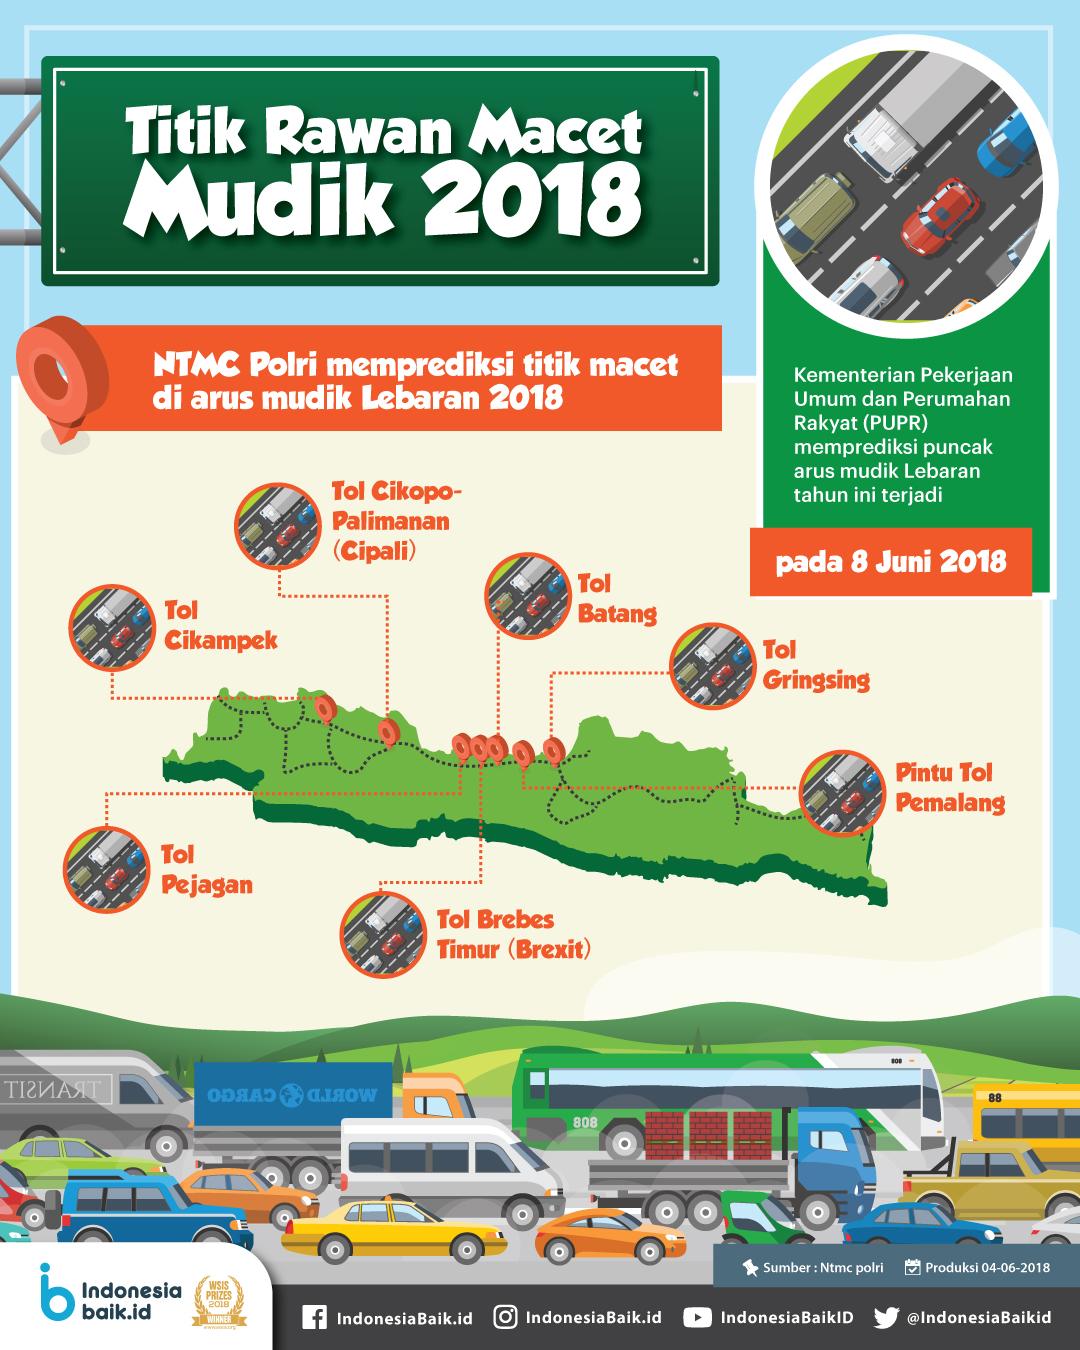 Titik Rawan Macet Mudik 2018